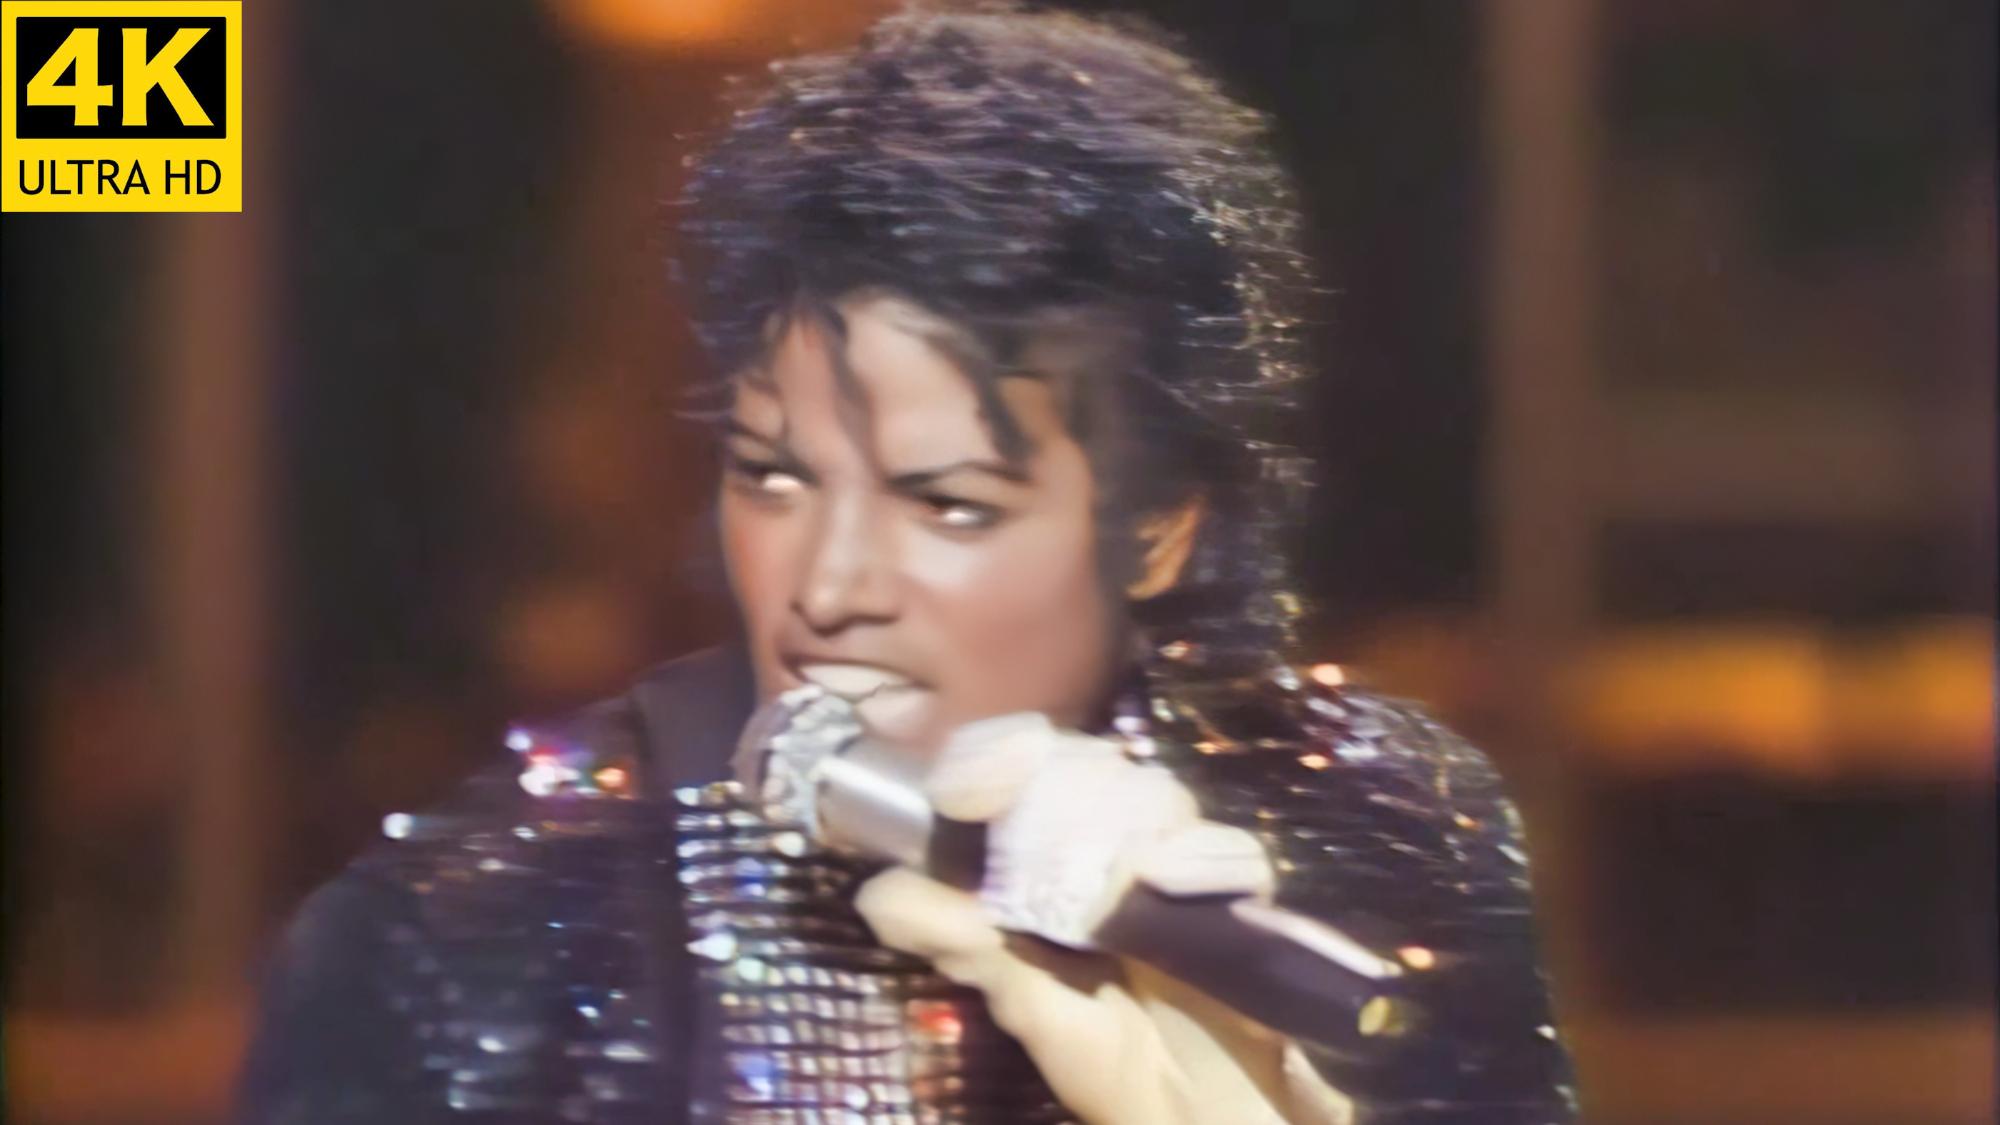 【4k修复60帧】迈克尔杰克逊【The.Jackson.Motown.25.演唱会】【收藏级画质】